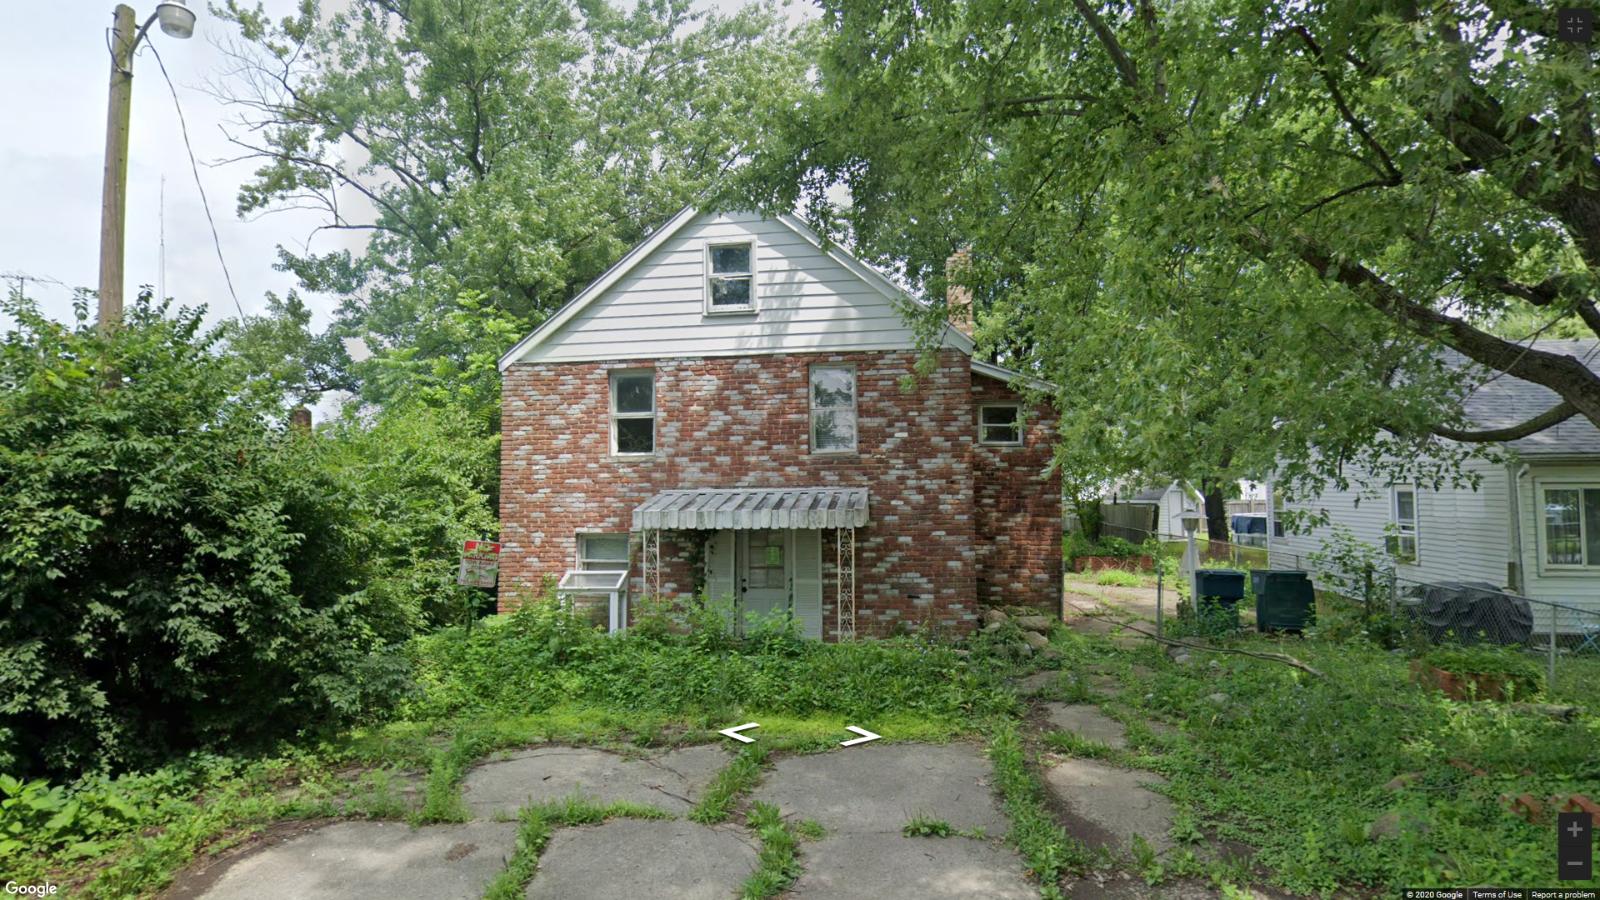 Big Brick House Investment Property Rehab  - $3,100.00